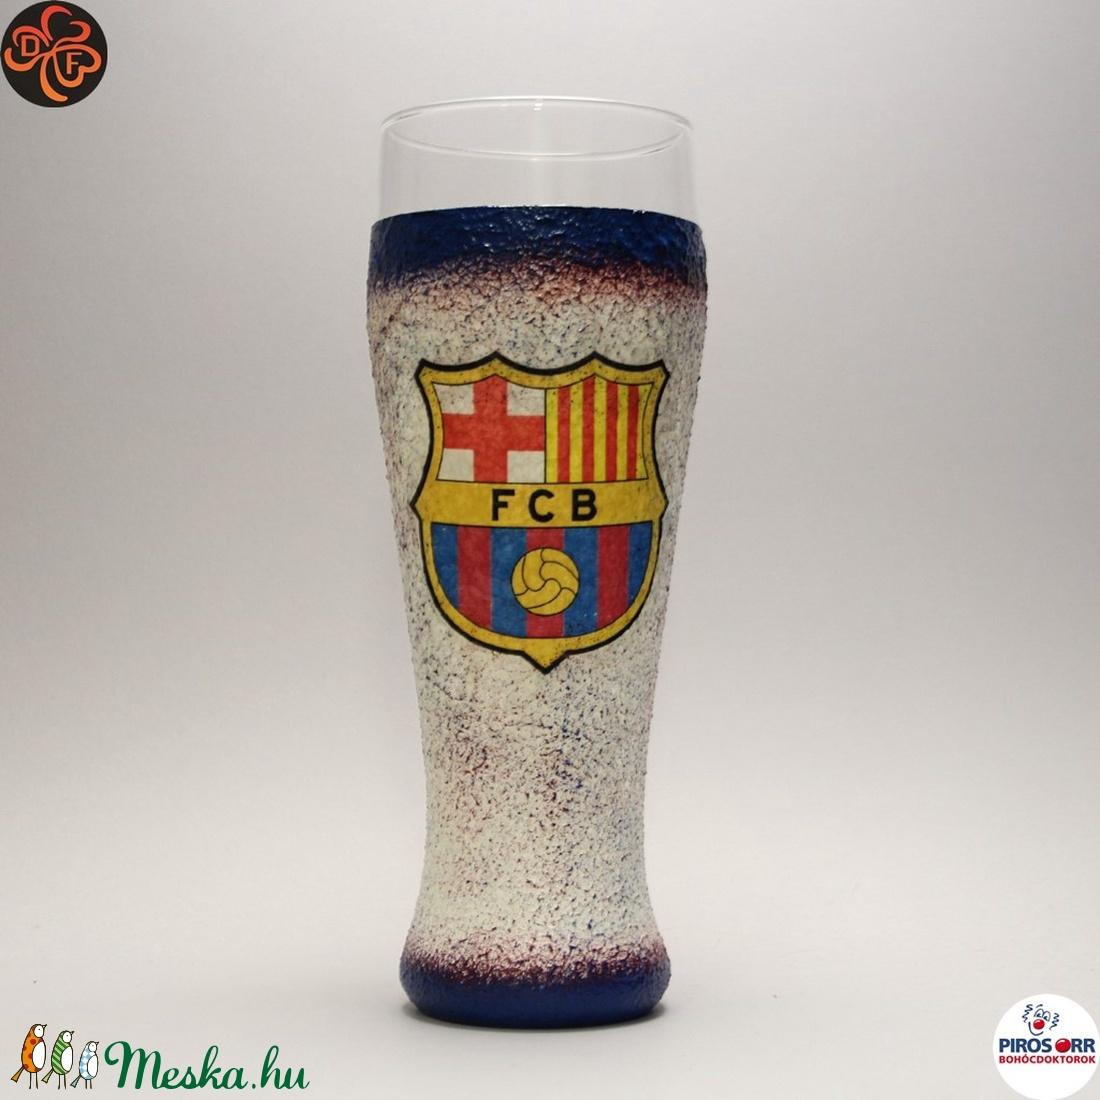 FC Barcelona sörös pohár ; foci szurkolóknak (decorfantasy) - Meska.hu